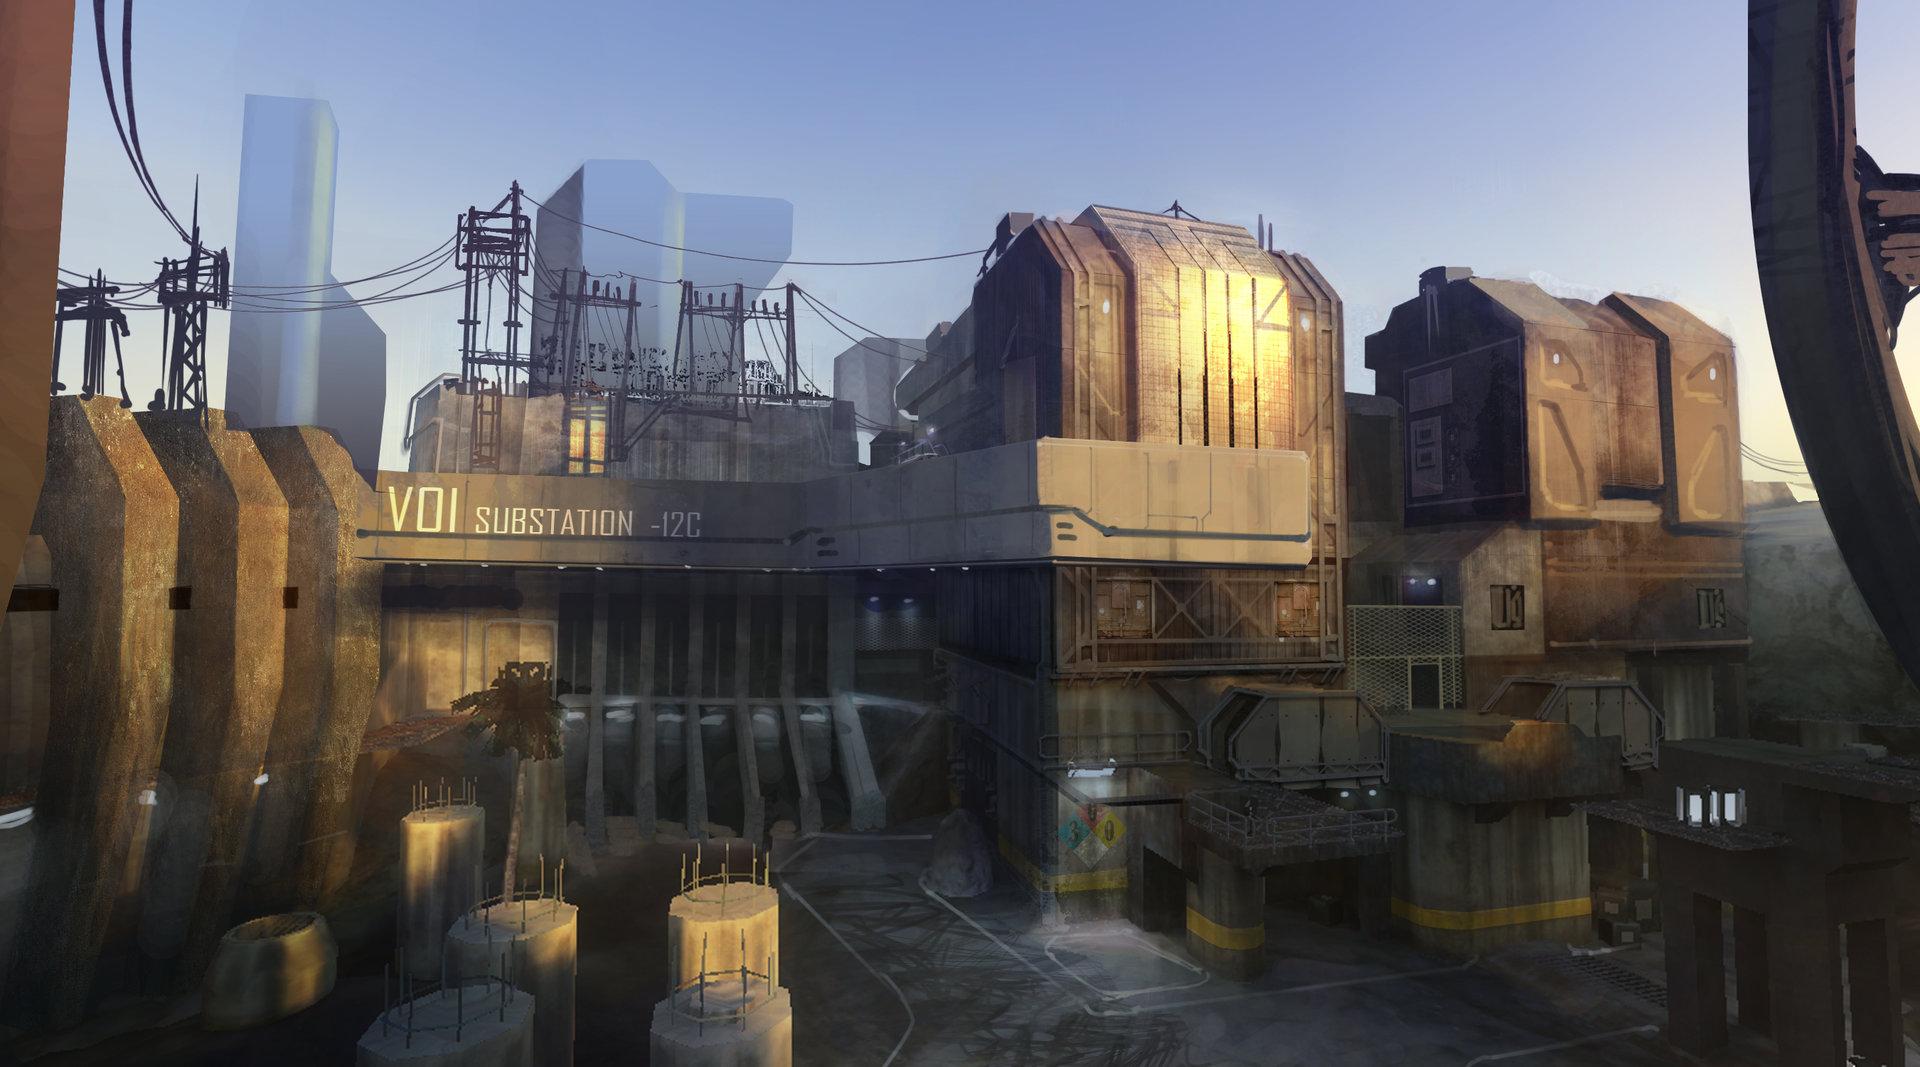 ArtStation - Halo 3 Zanzibar multiplayer map concepts, Isaac